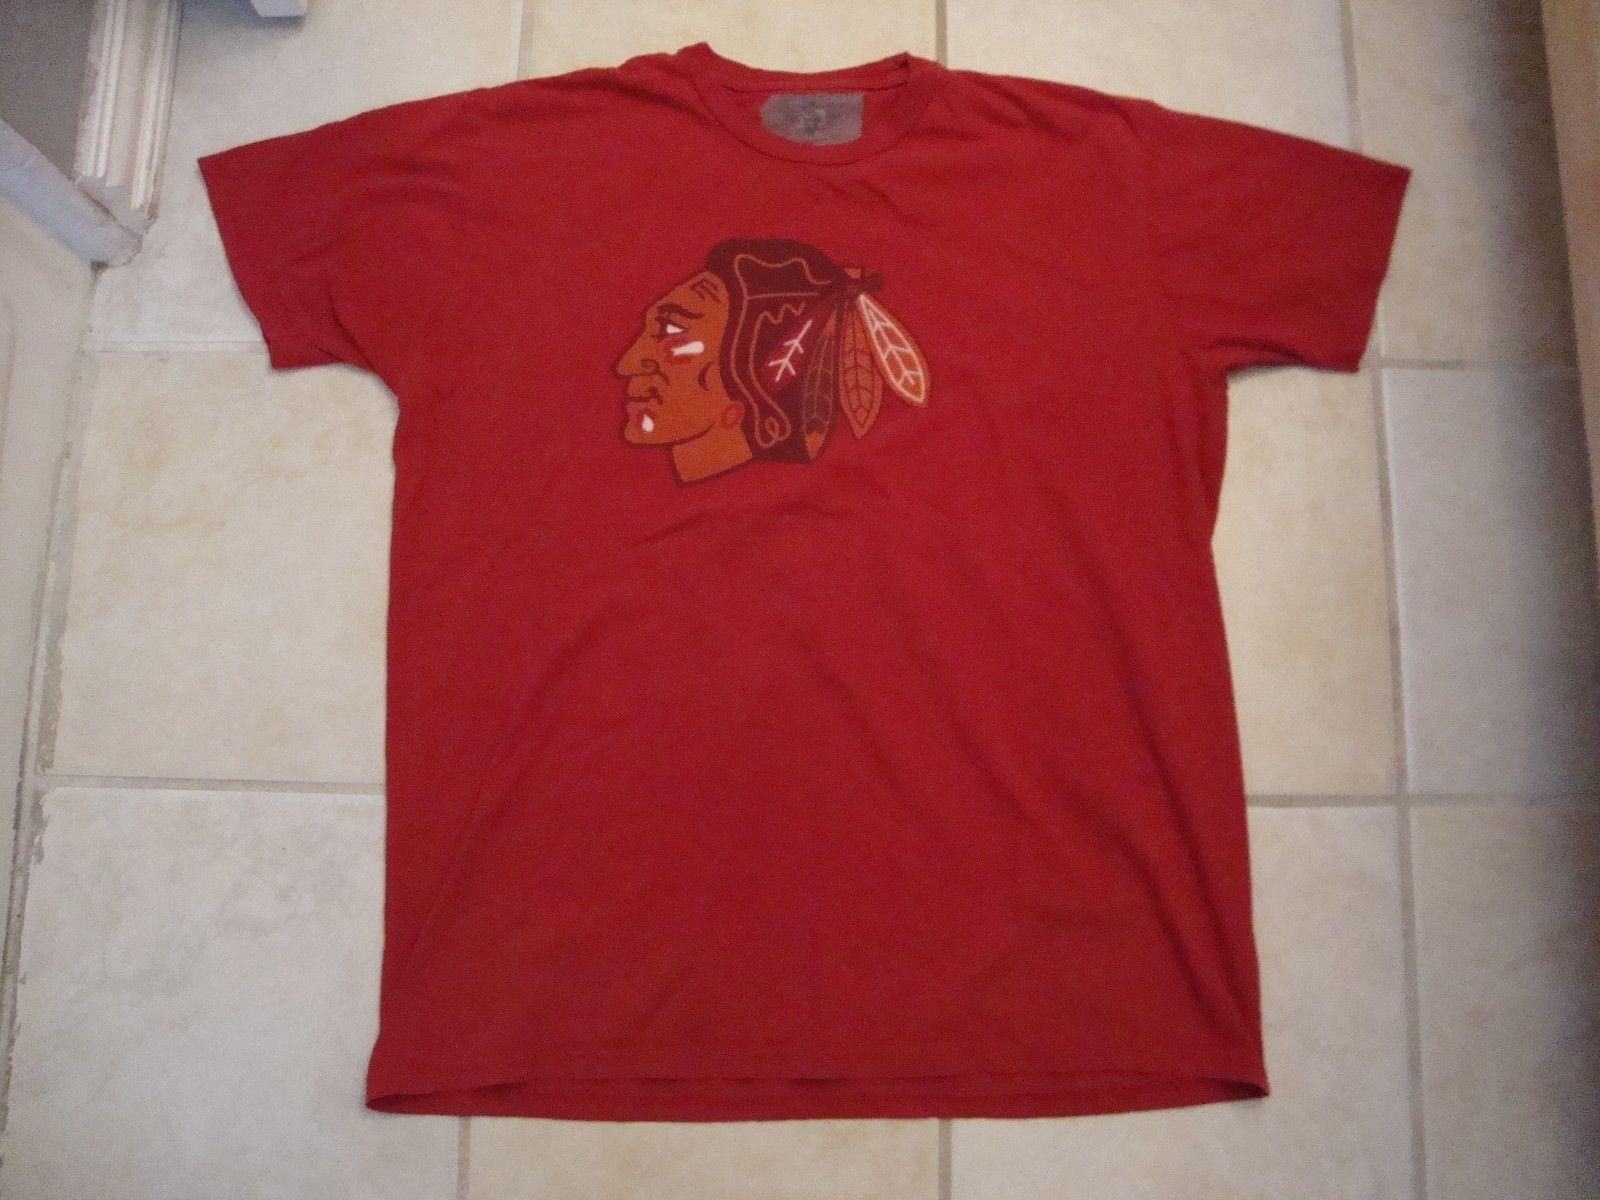 NHL Chicago Blackhawks Sportswear Fan Apparel Red Cotton T Shirt Size XL